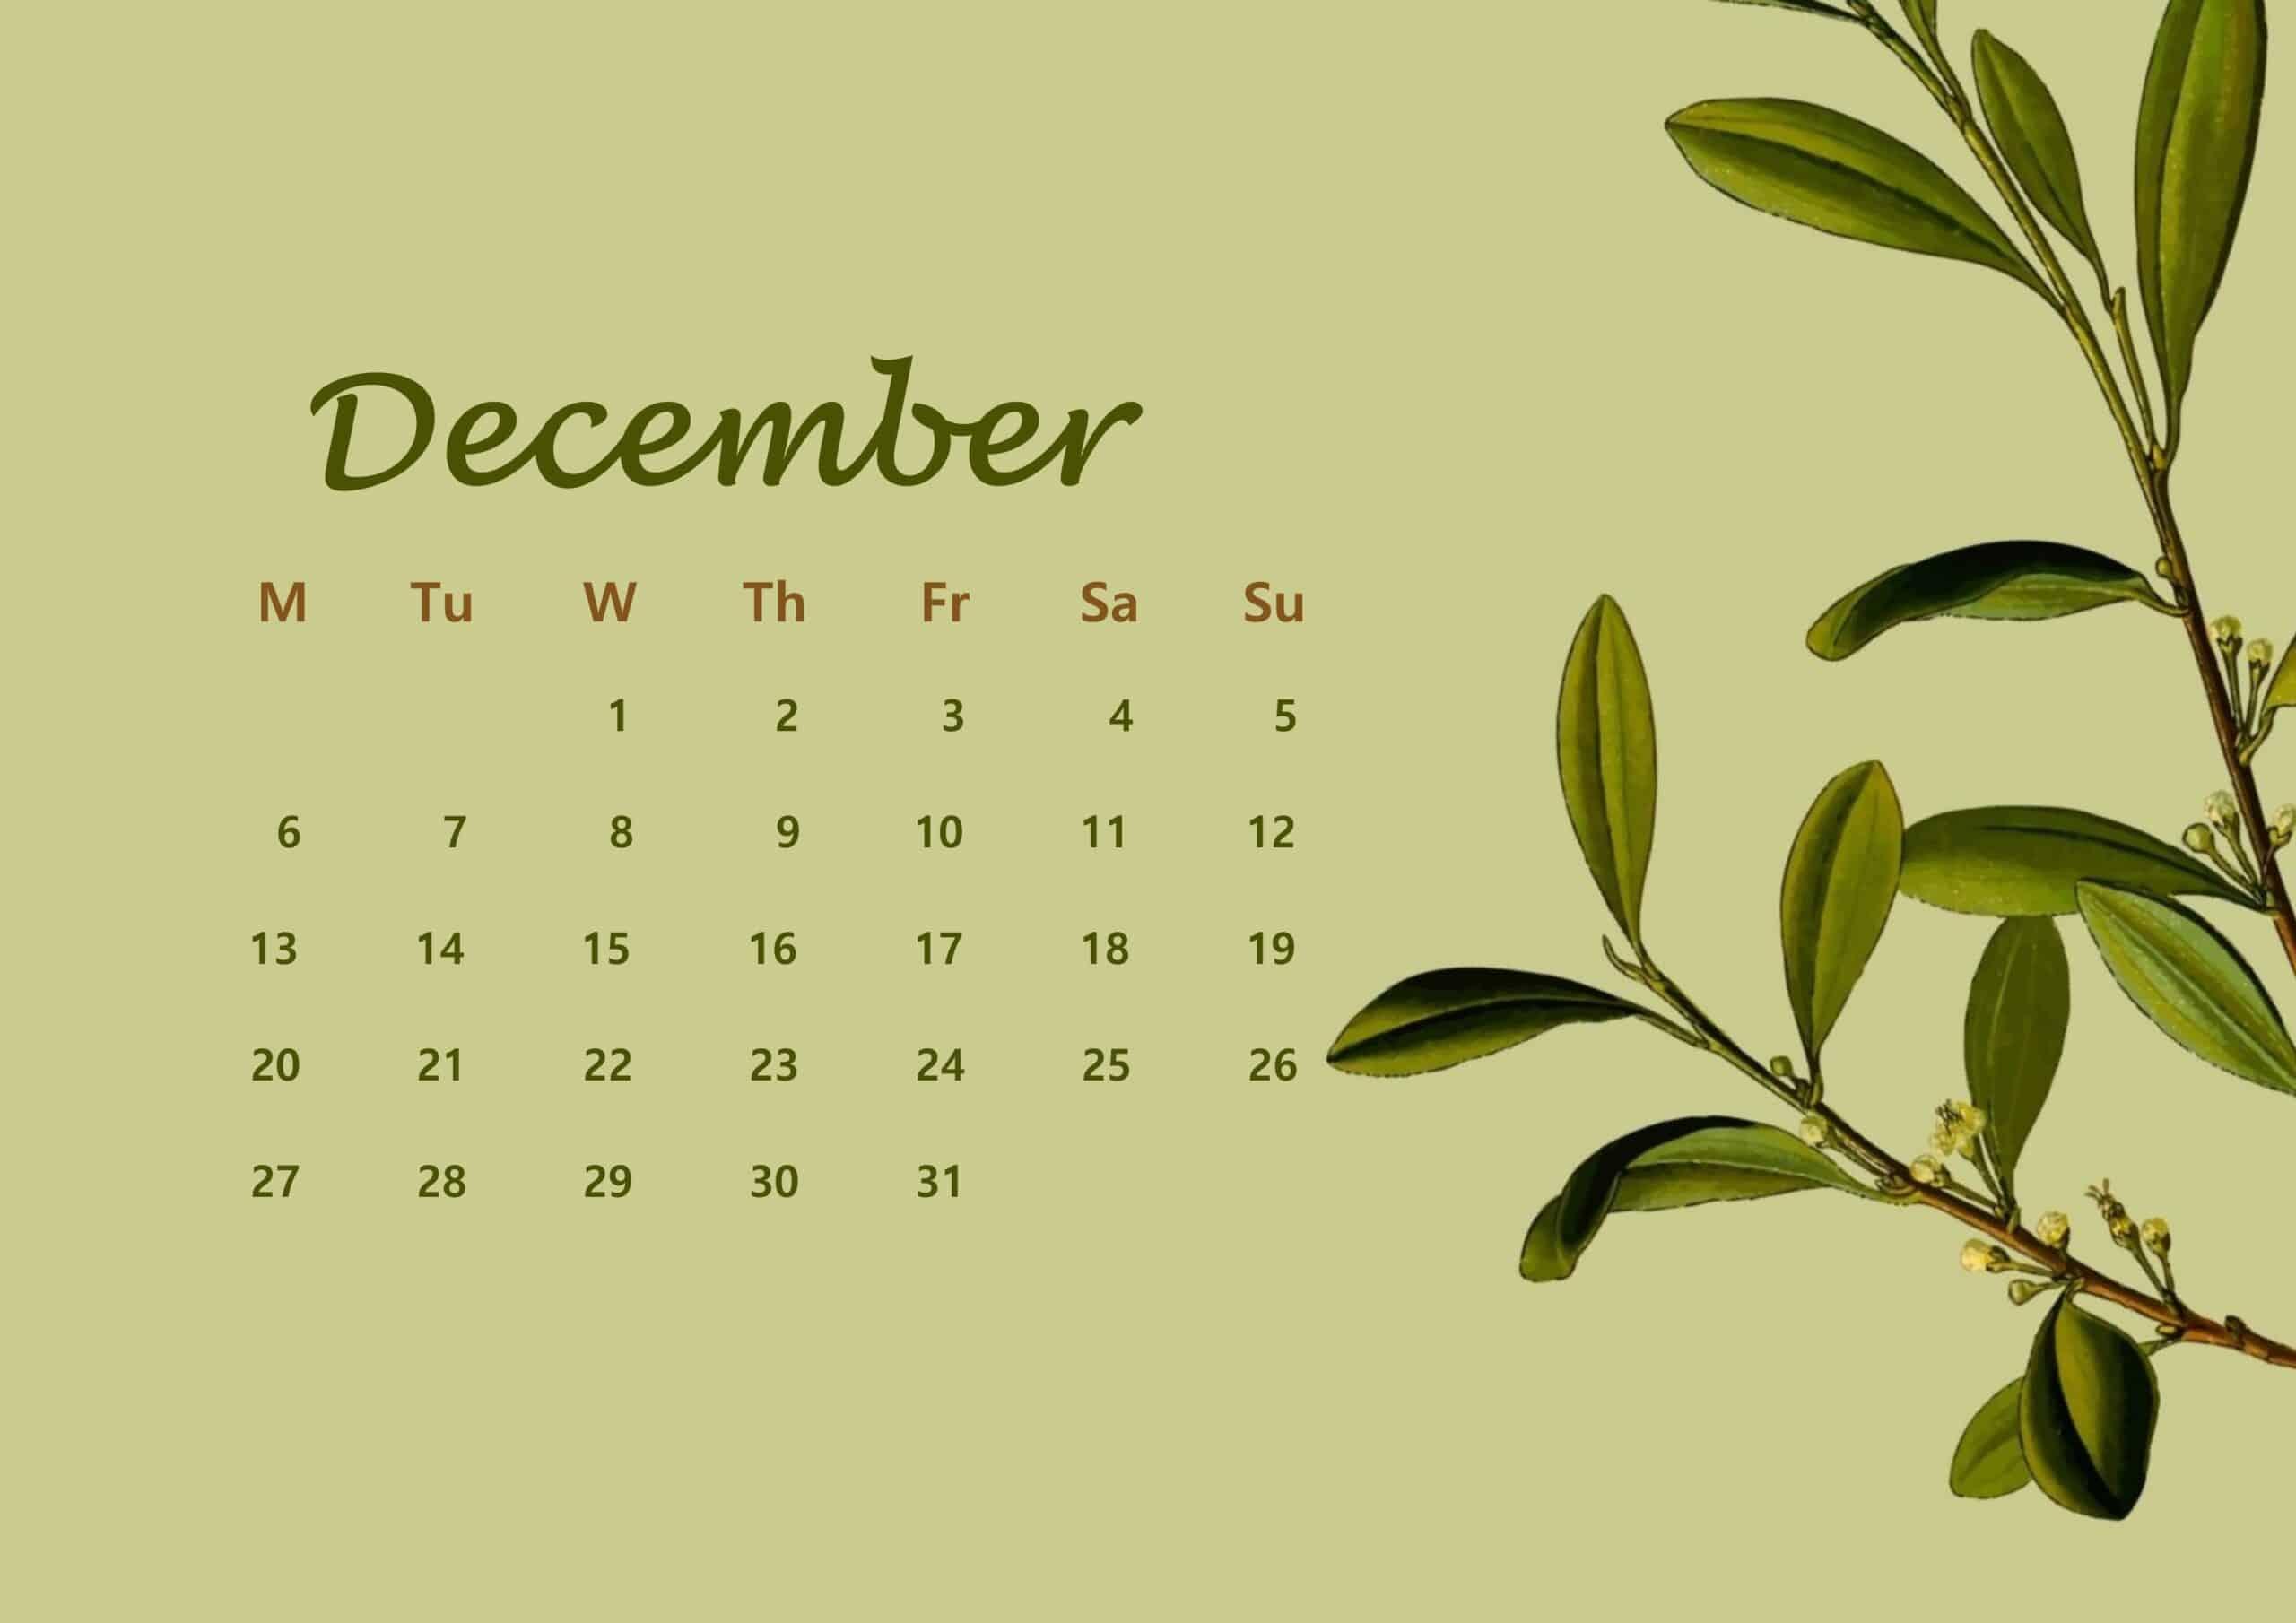 December Calendar 2021 Floral